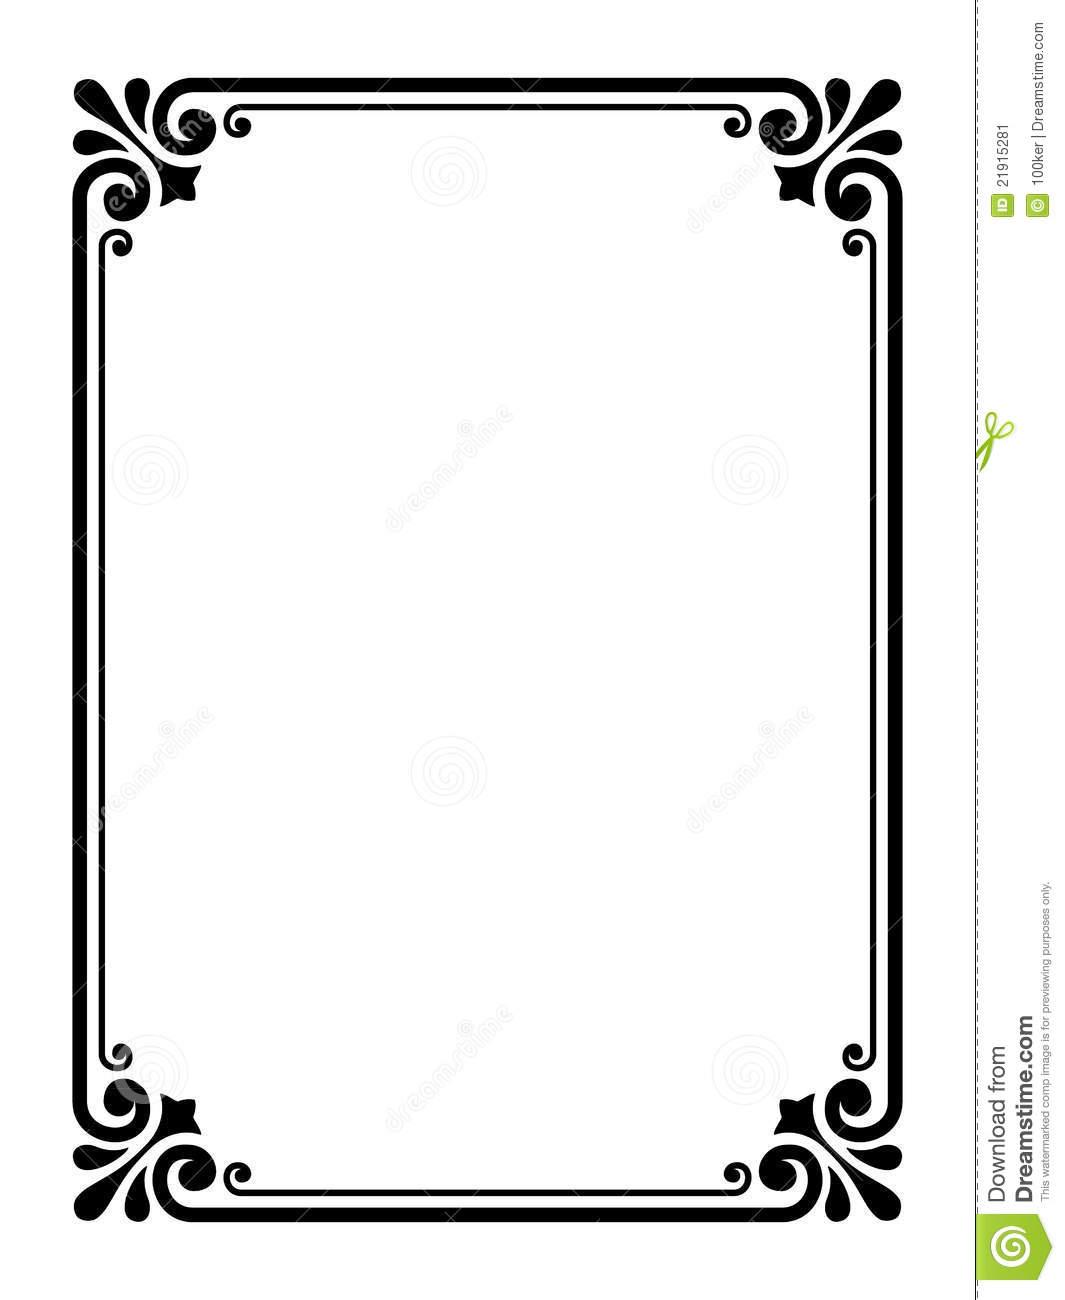 Simple Decorative Border Designs